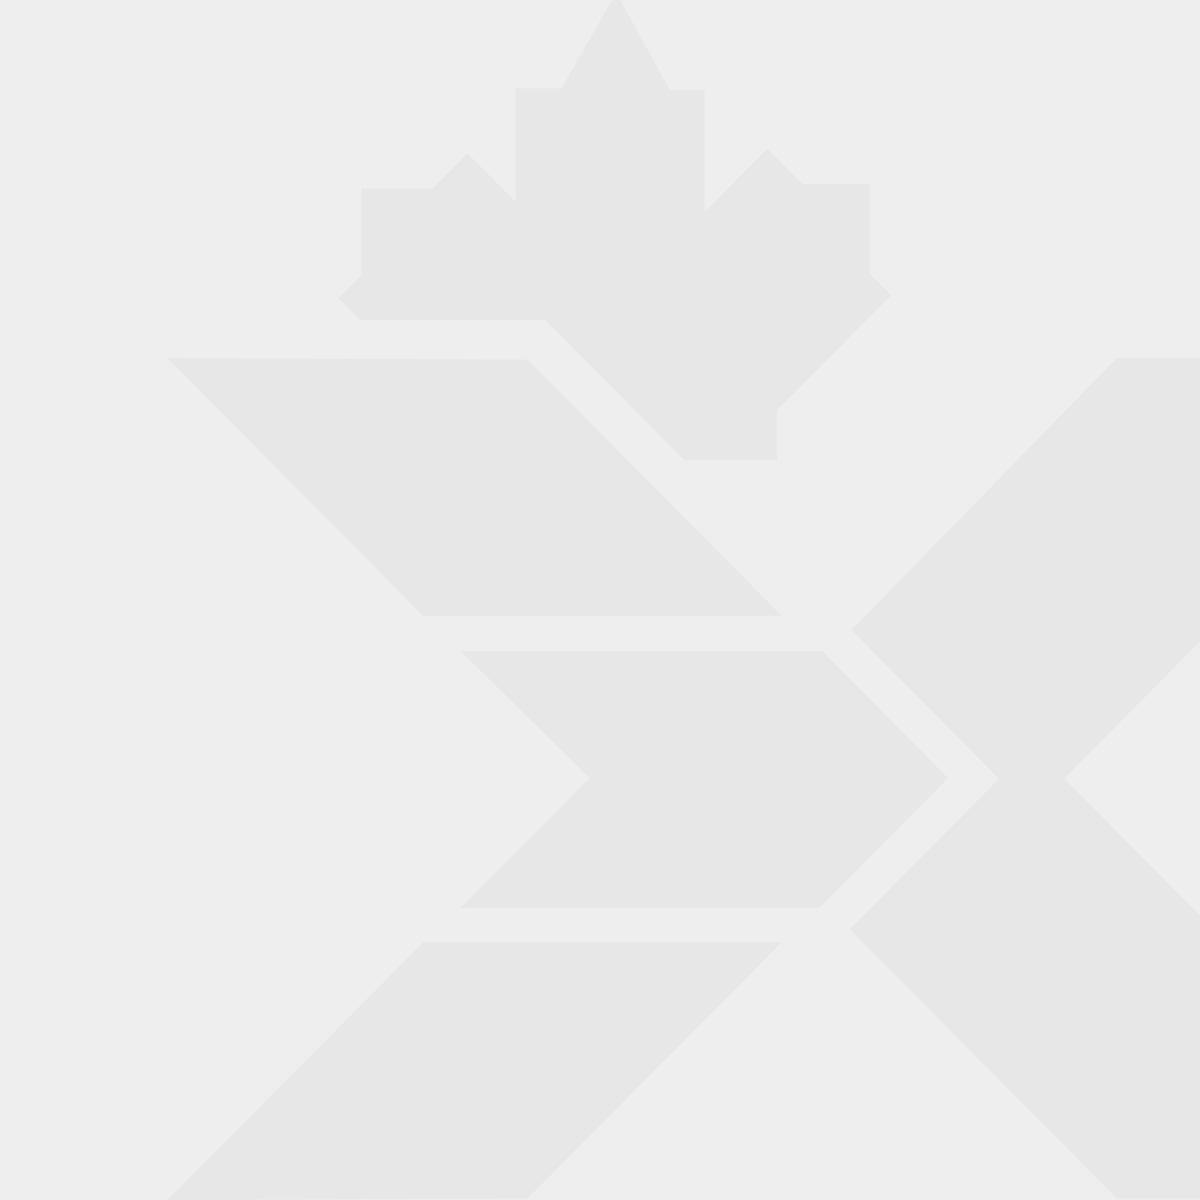 BRAUN - Multigroom Shaver (3020)